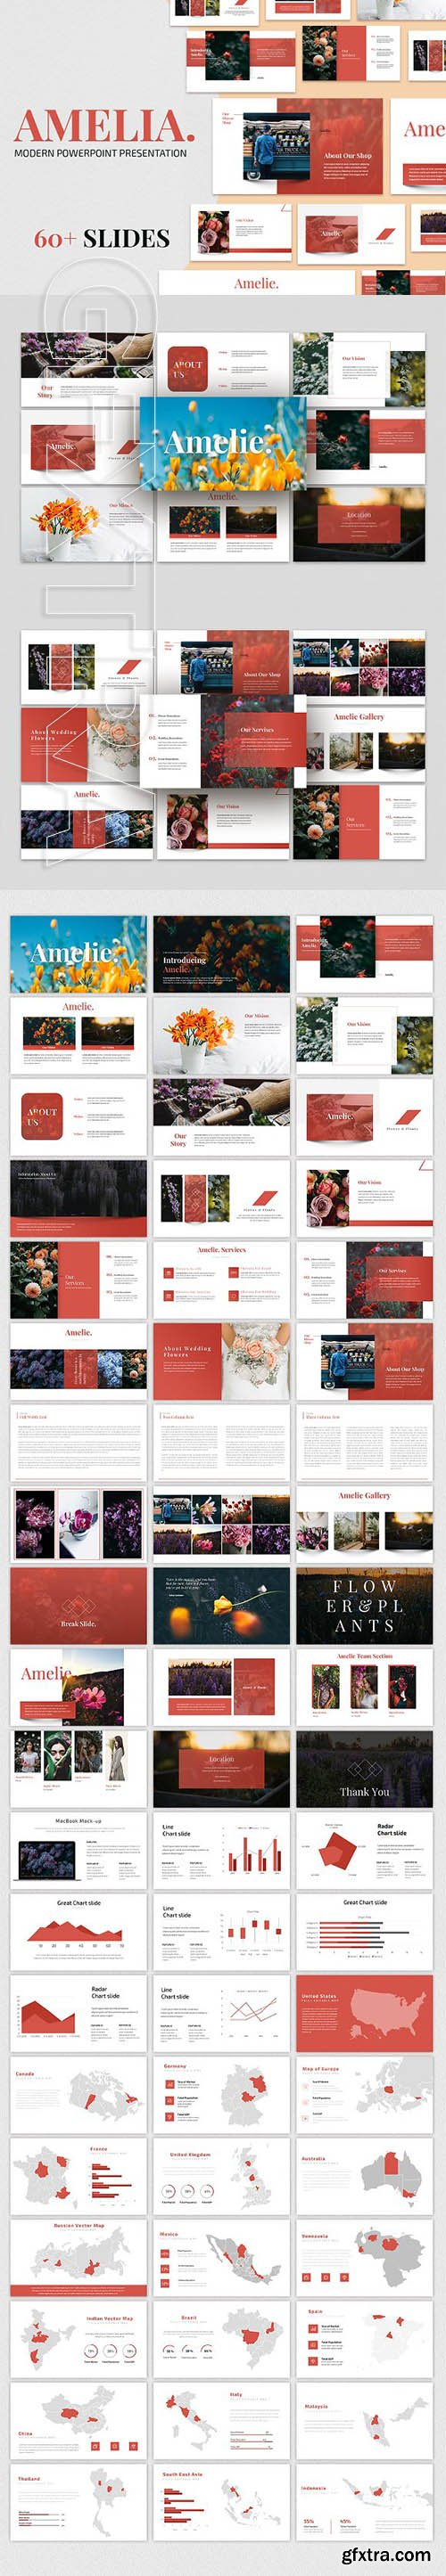 CreativeMarket - AMELIA - Modern Powerpoint Template 2868665